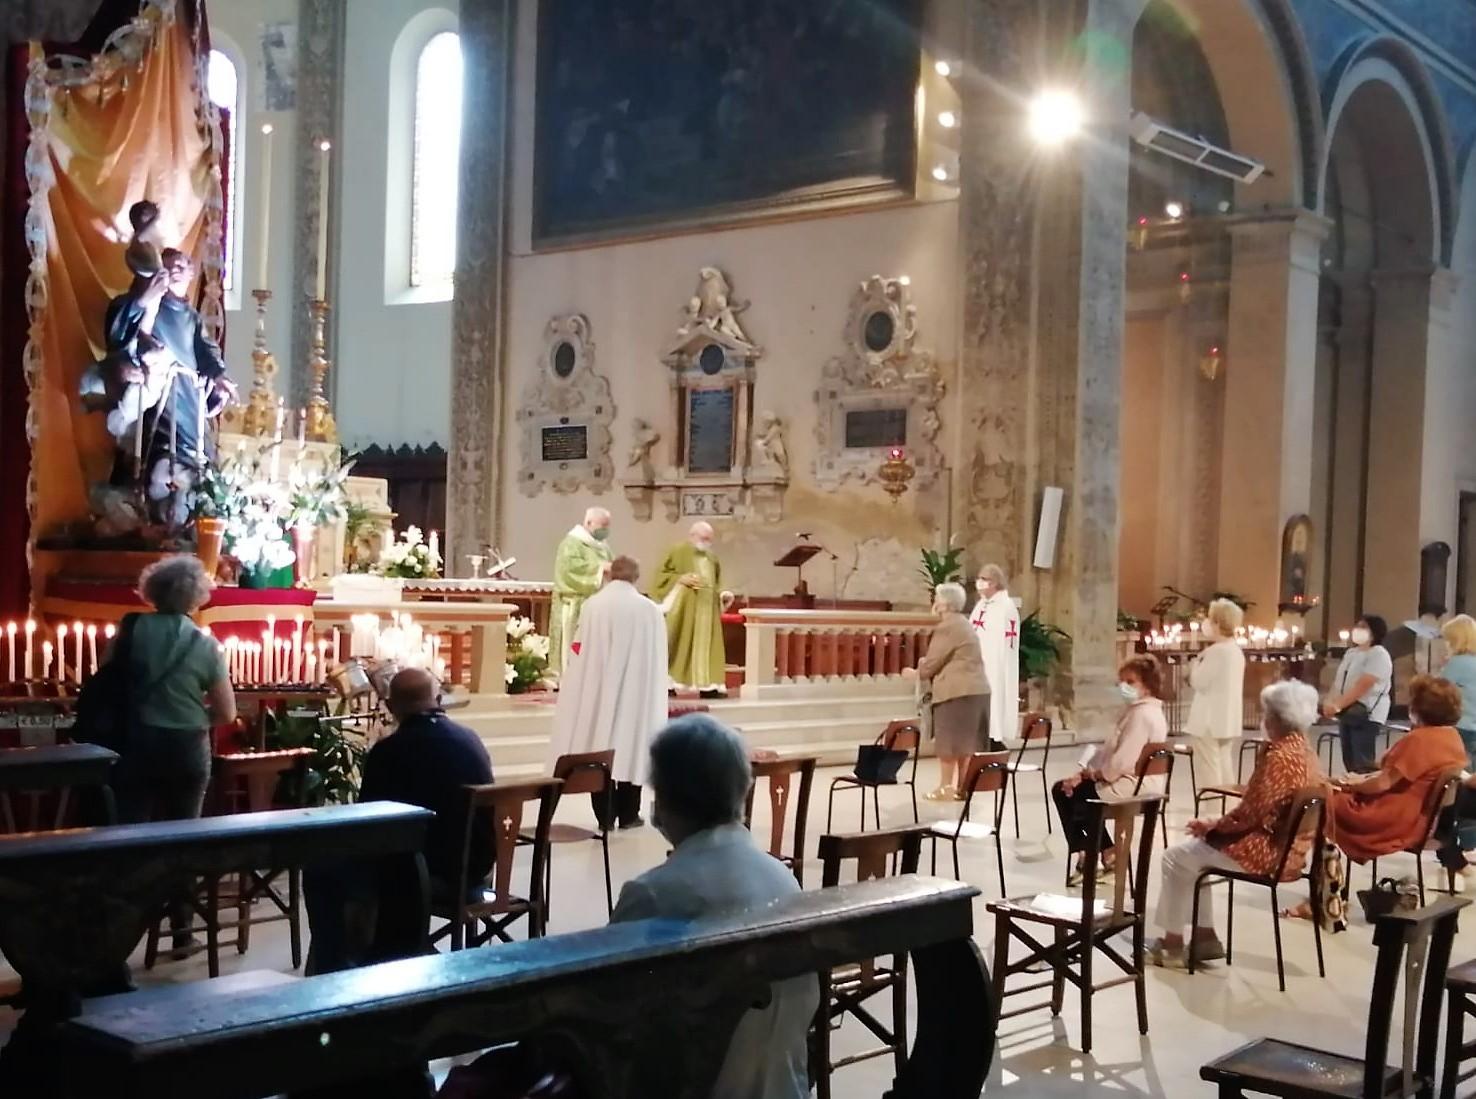 Turno di custodia – Basilica di San Francesco – Ferrara 13.06.2021